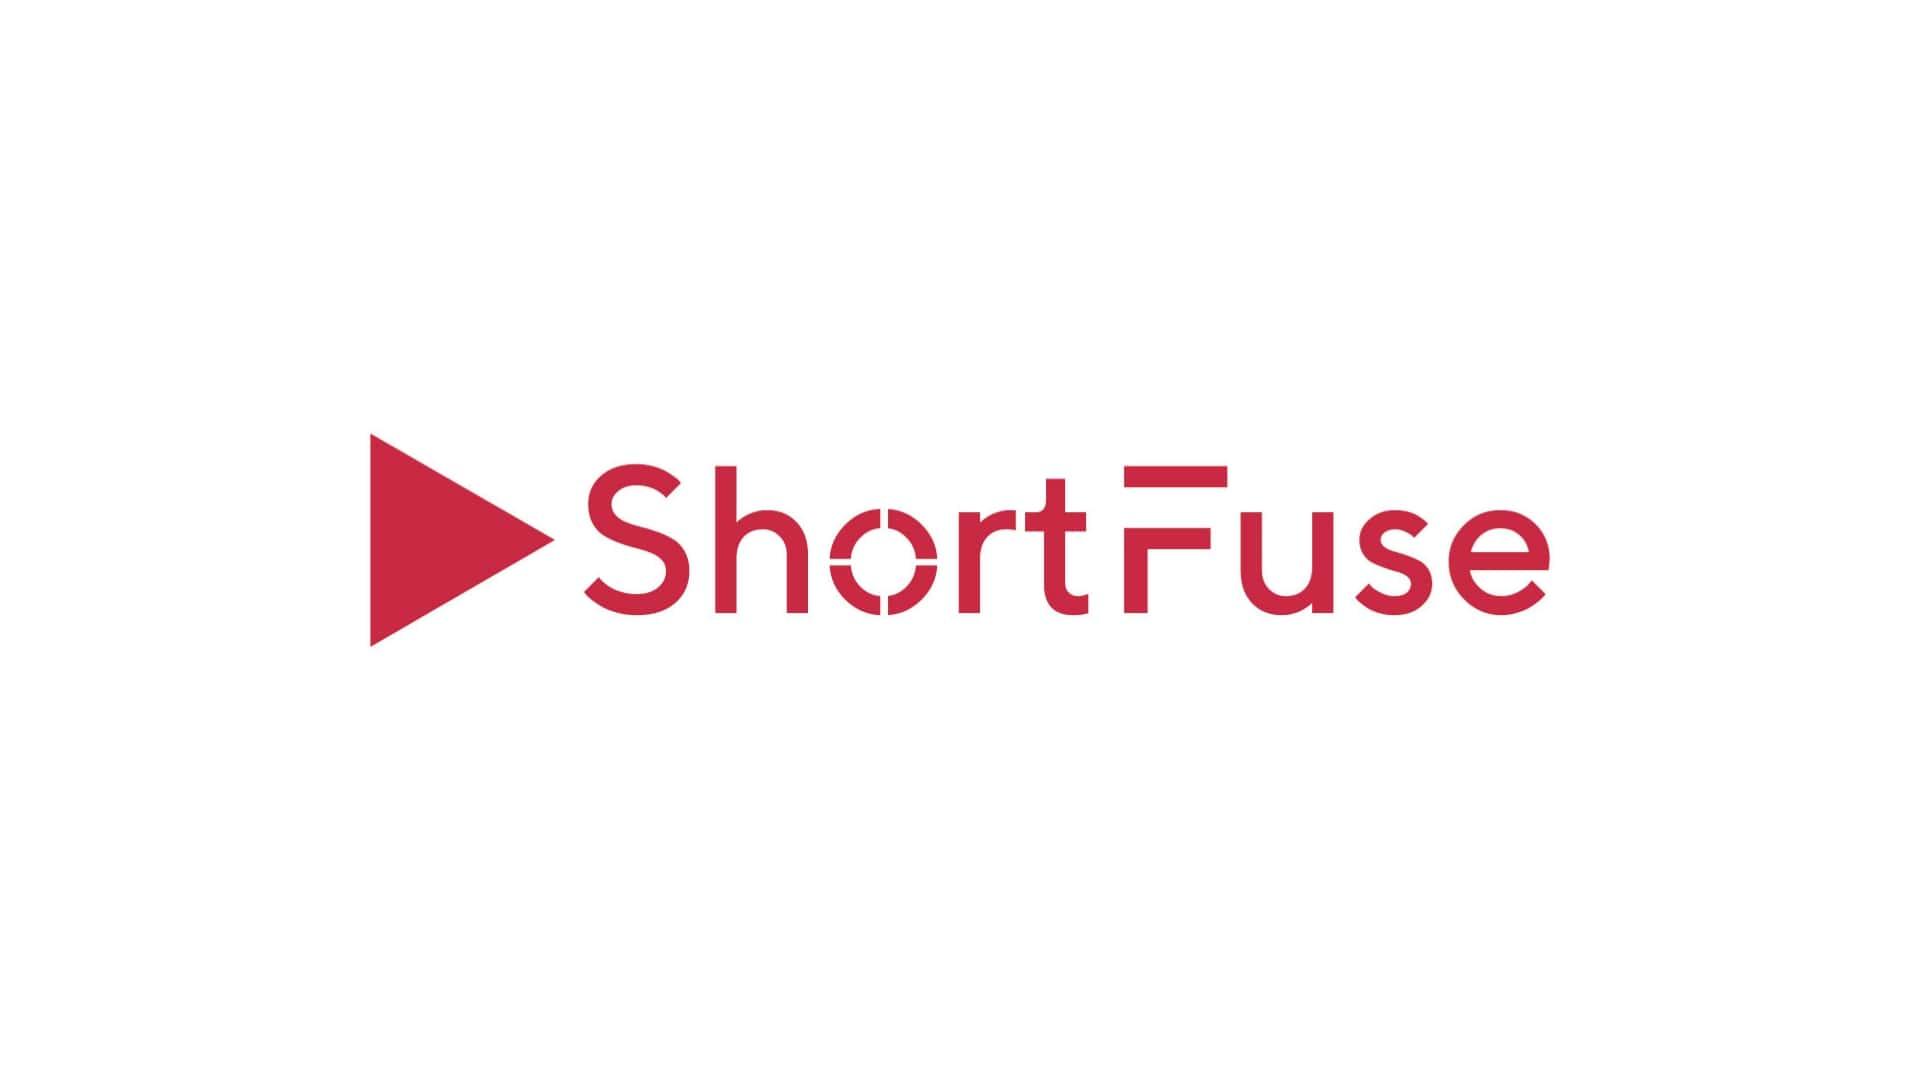 Submit Your Short Film to Film Birmingham's ShortFuse Film Night